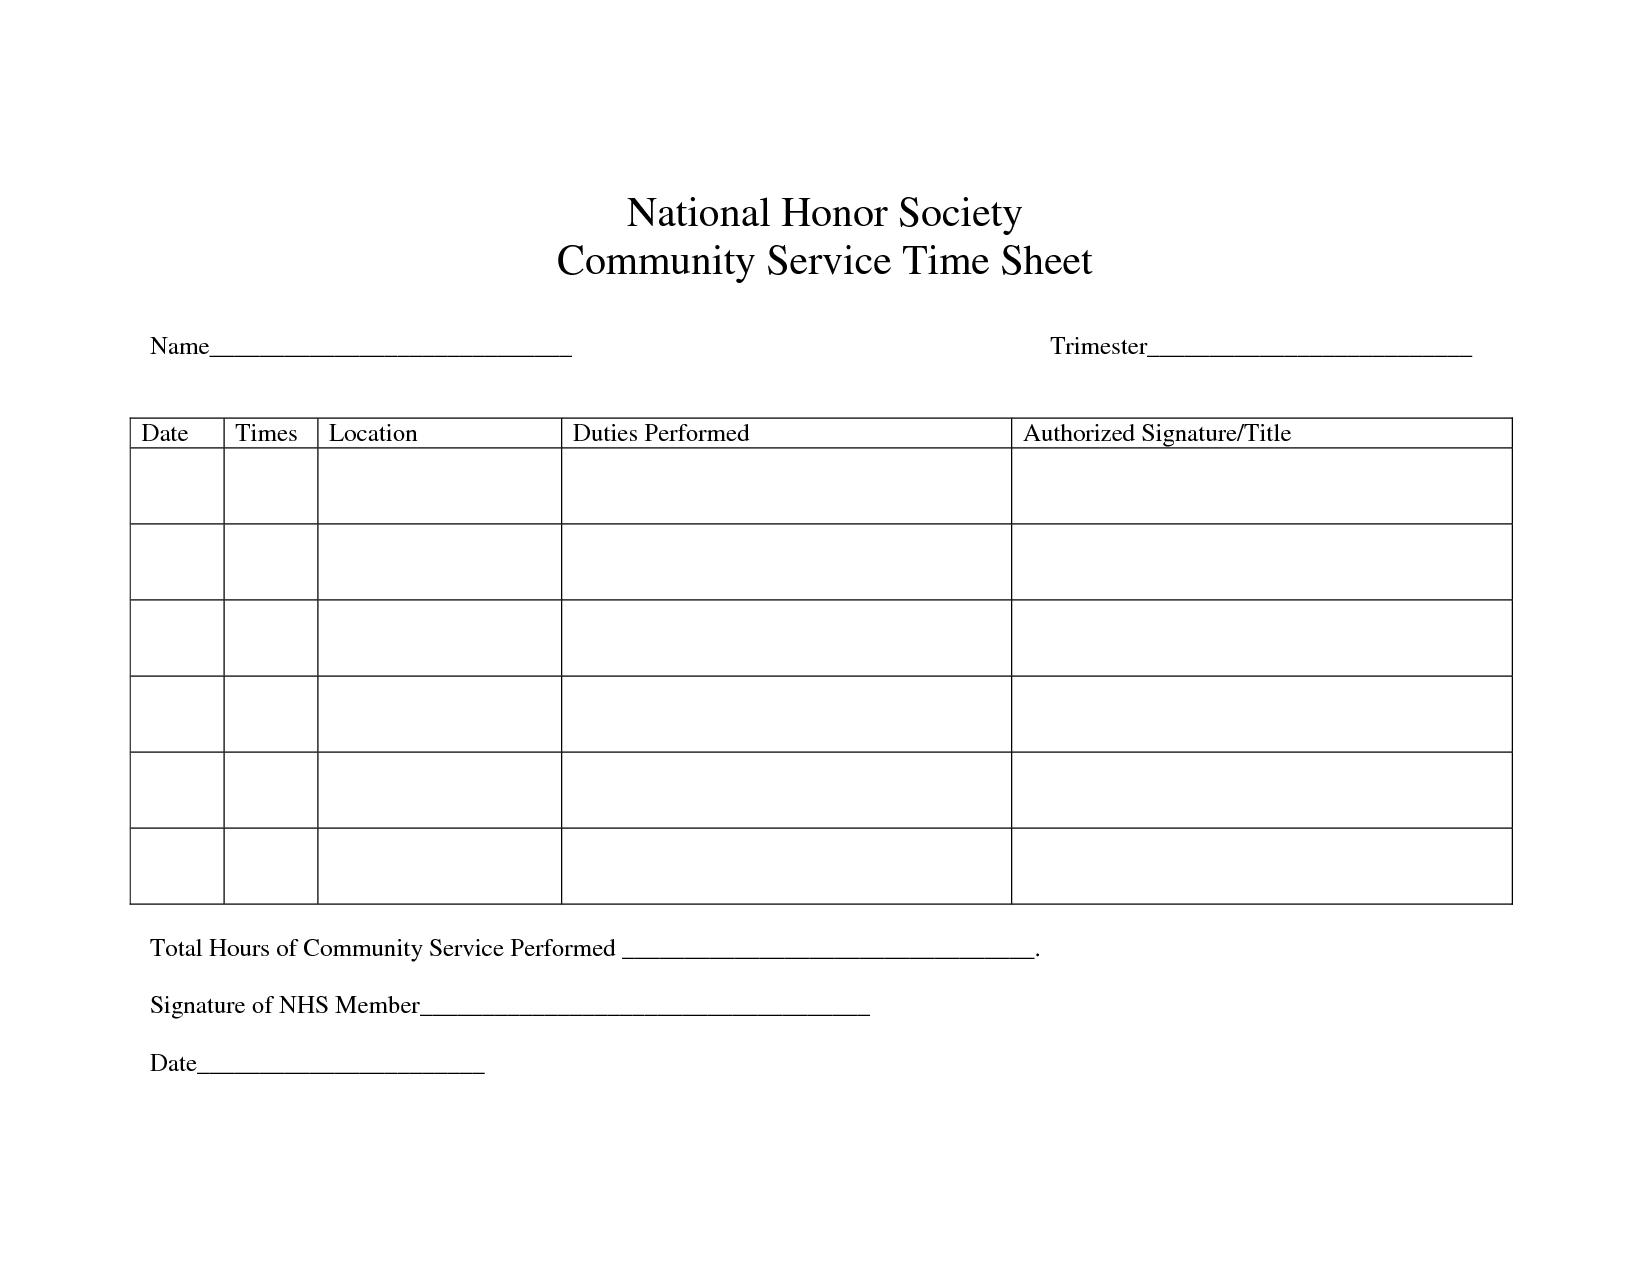 National Honor Society Lincoln Honor Society